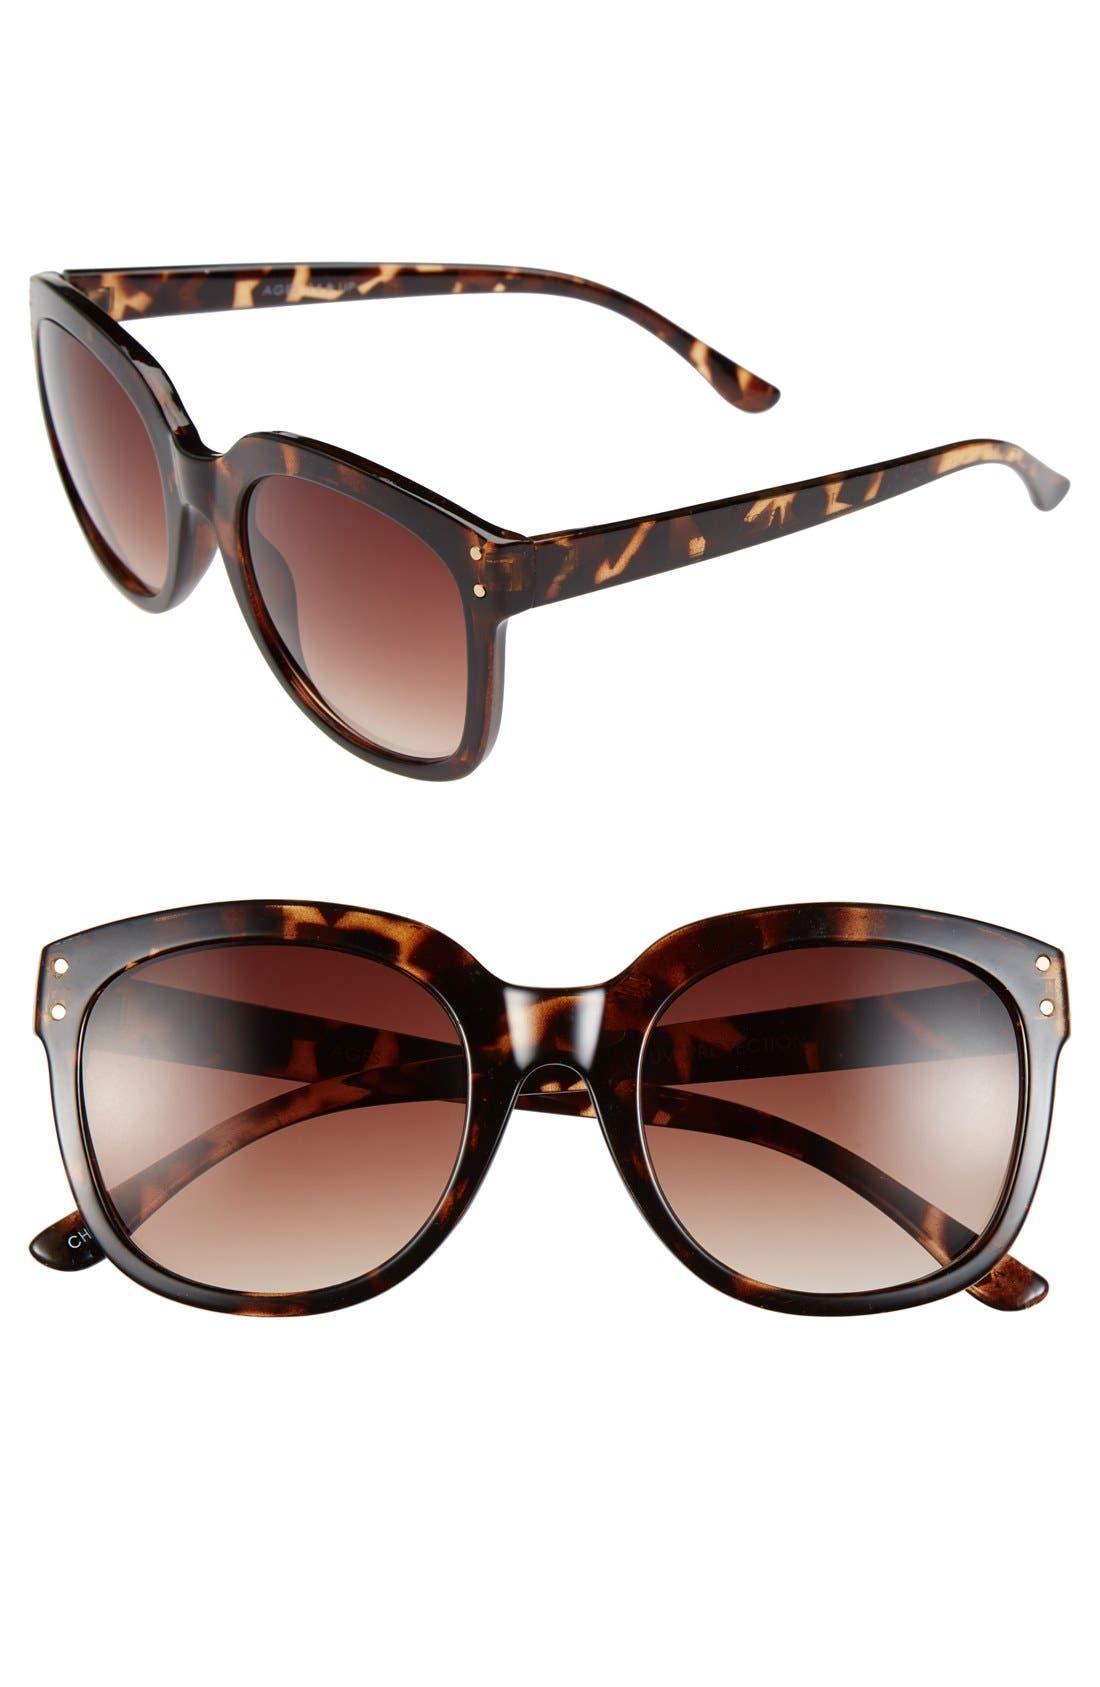 Alternate Image 1 Selected - Fantas Eyes 'Habeas Corpus' Sunglasses (Juniors)